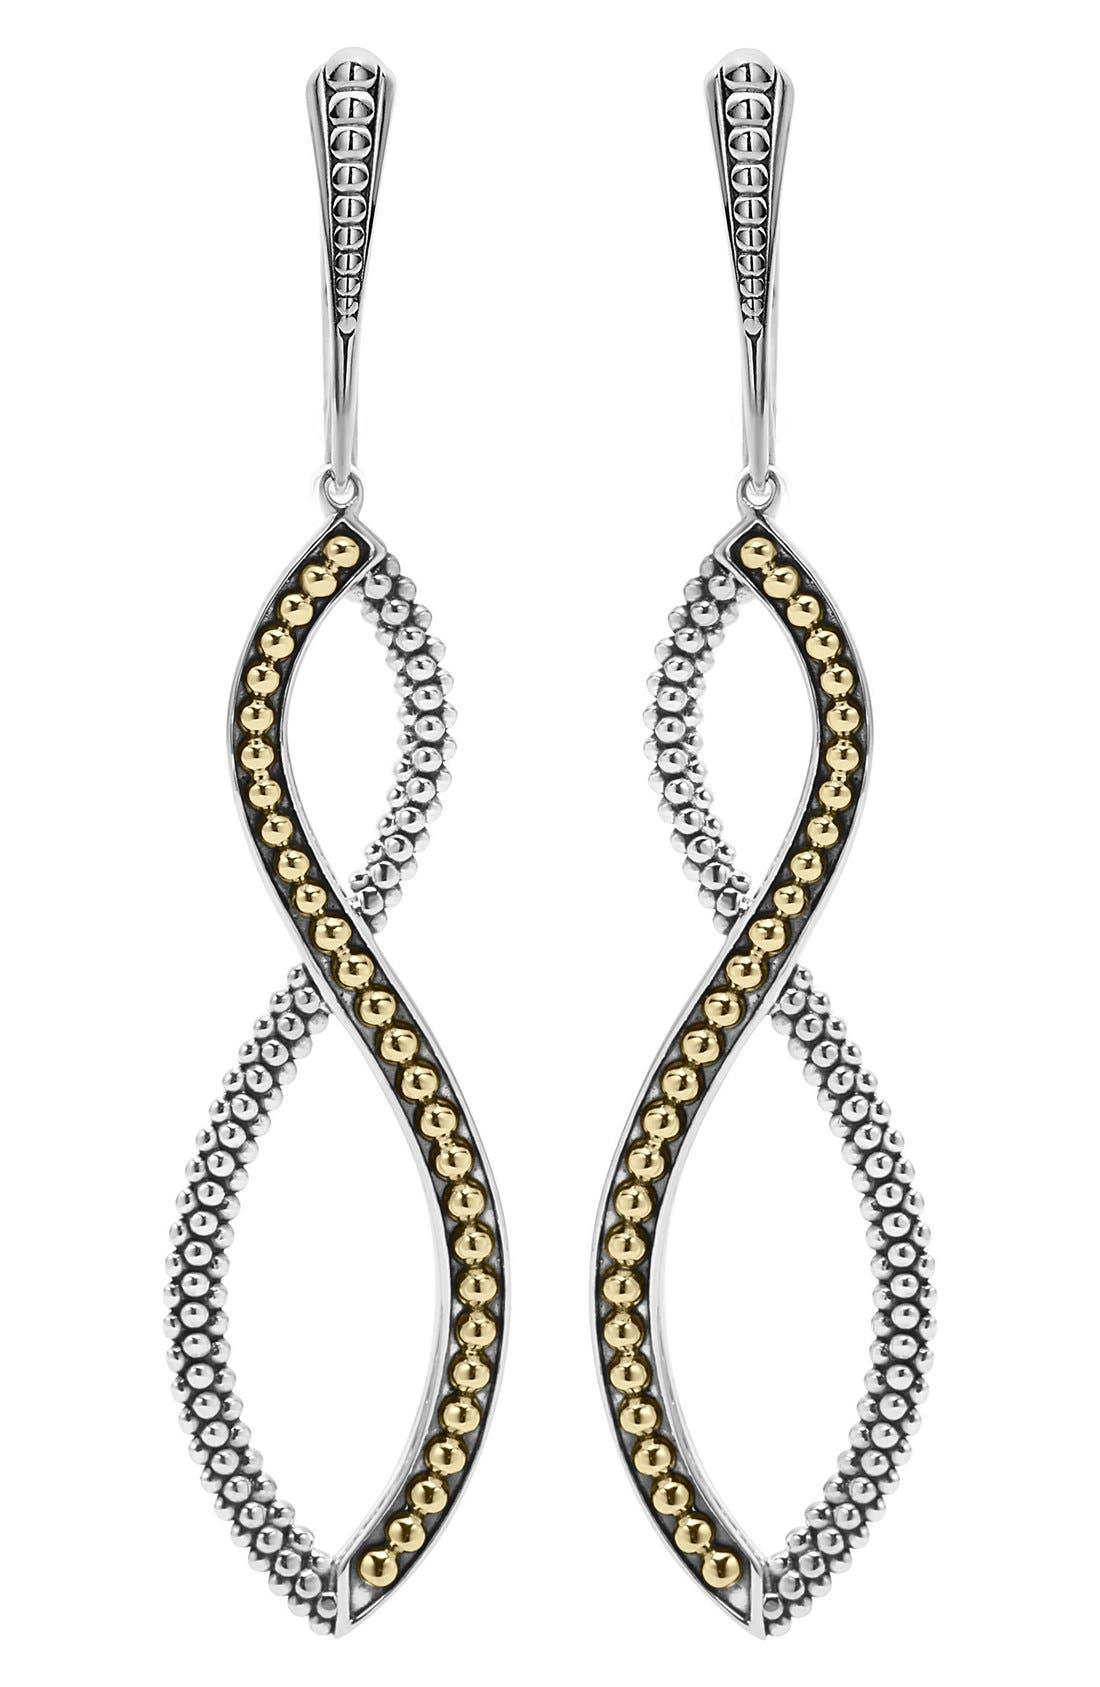 Infinity Twist Drop Earrings,                             Main thumbnail 1, color,                             Silver/ Gold